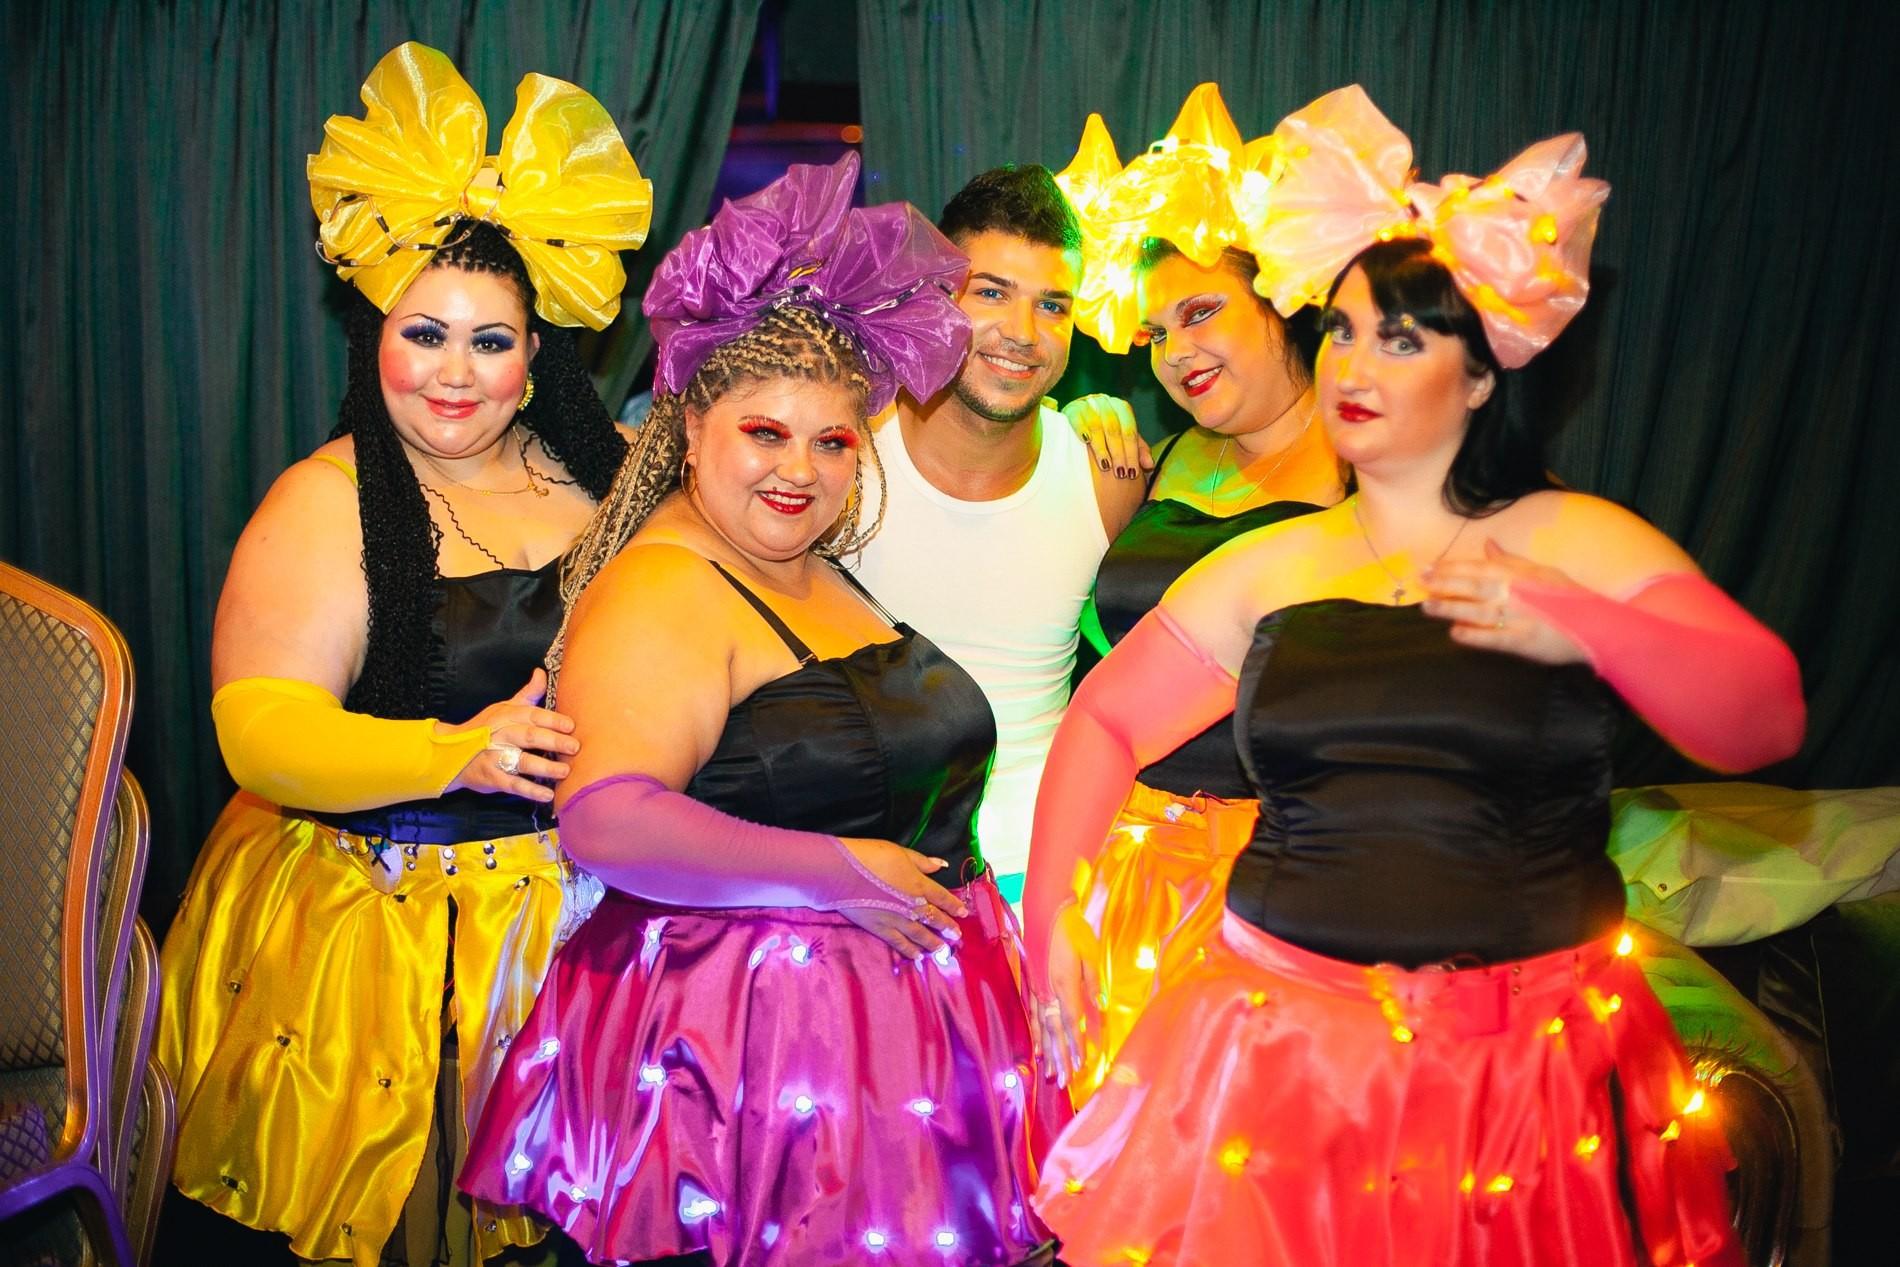 Танцующие толстушки фото #14